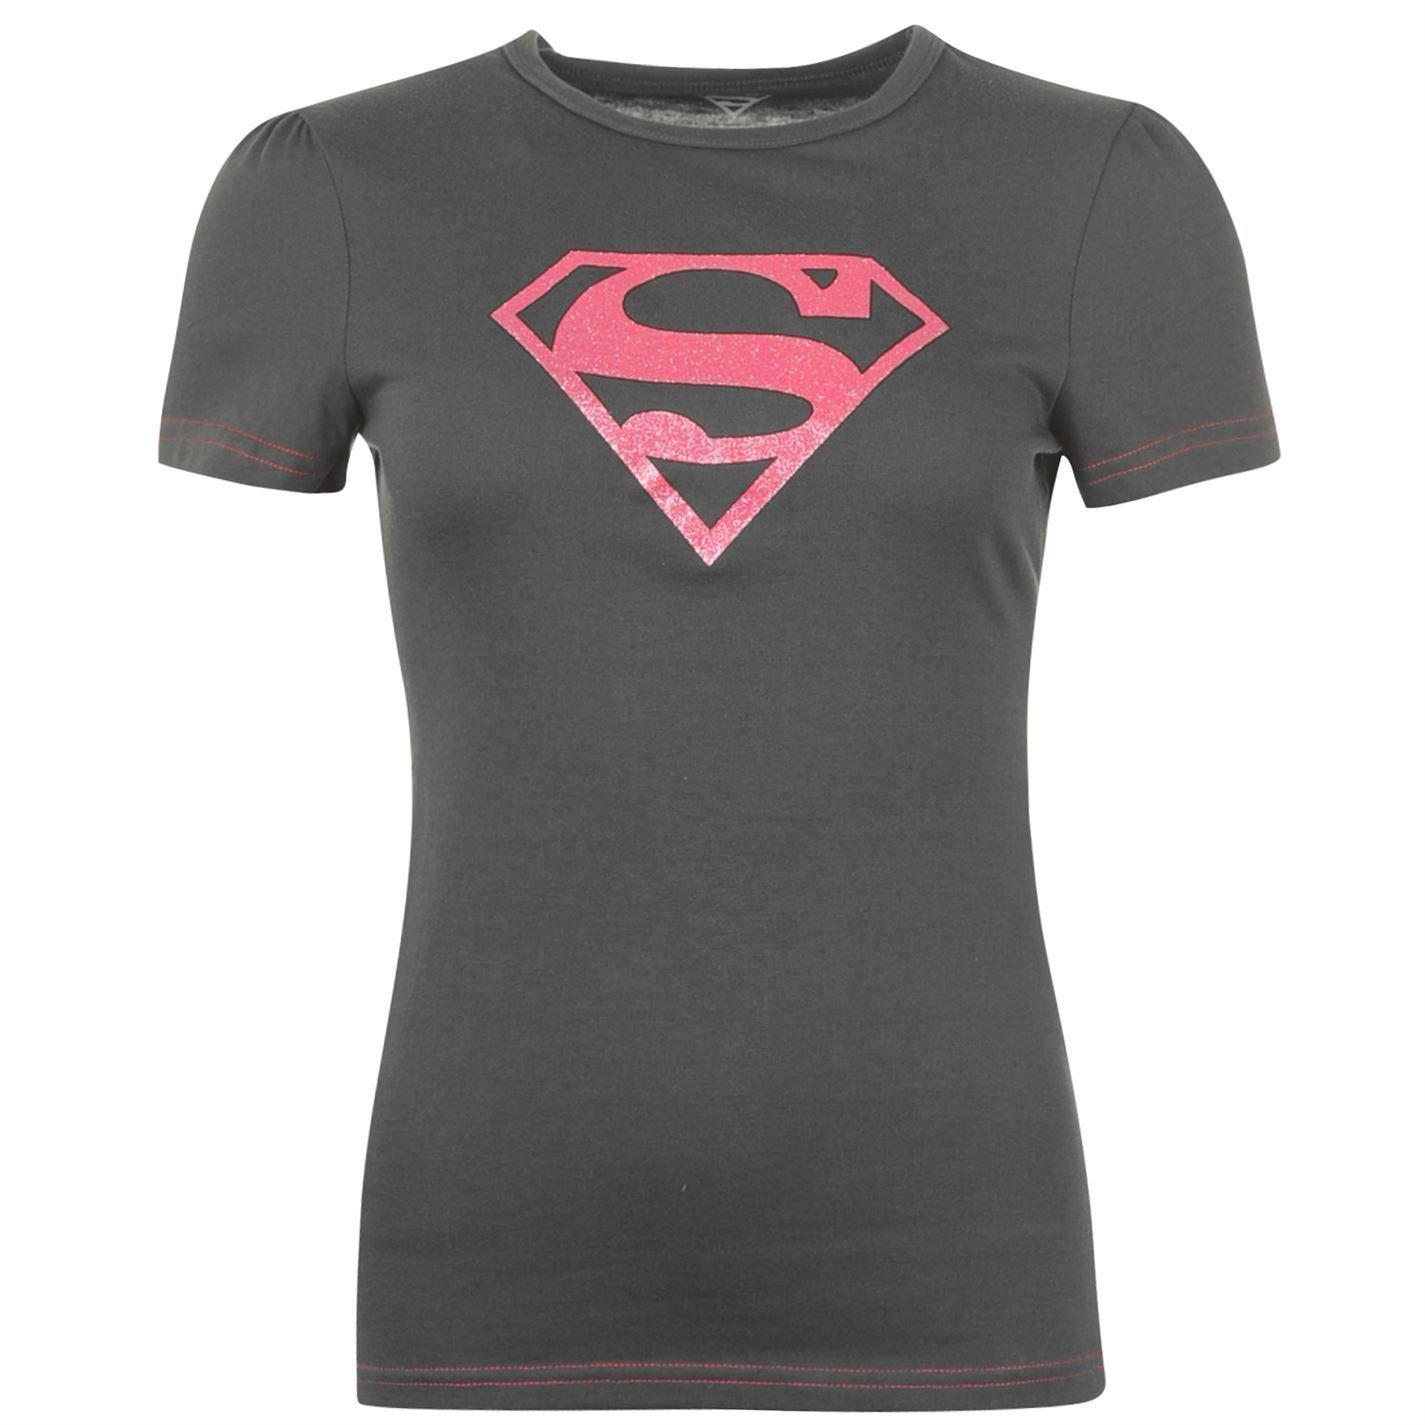 Superman Womens Ladies Tshirt Top Tee Crew Neck